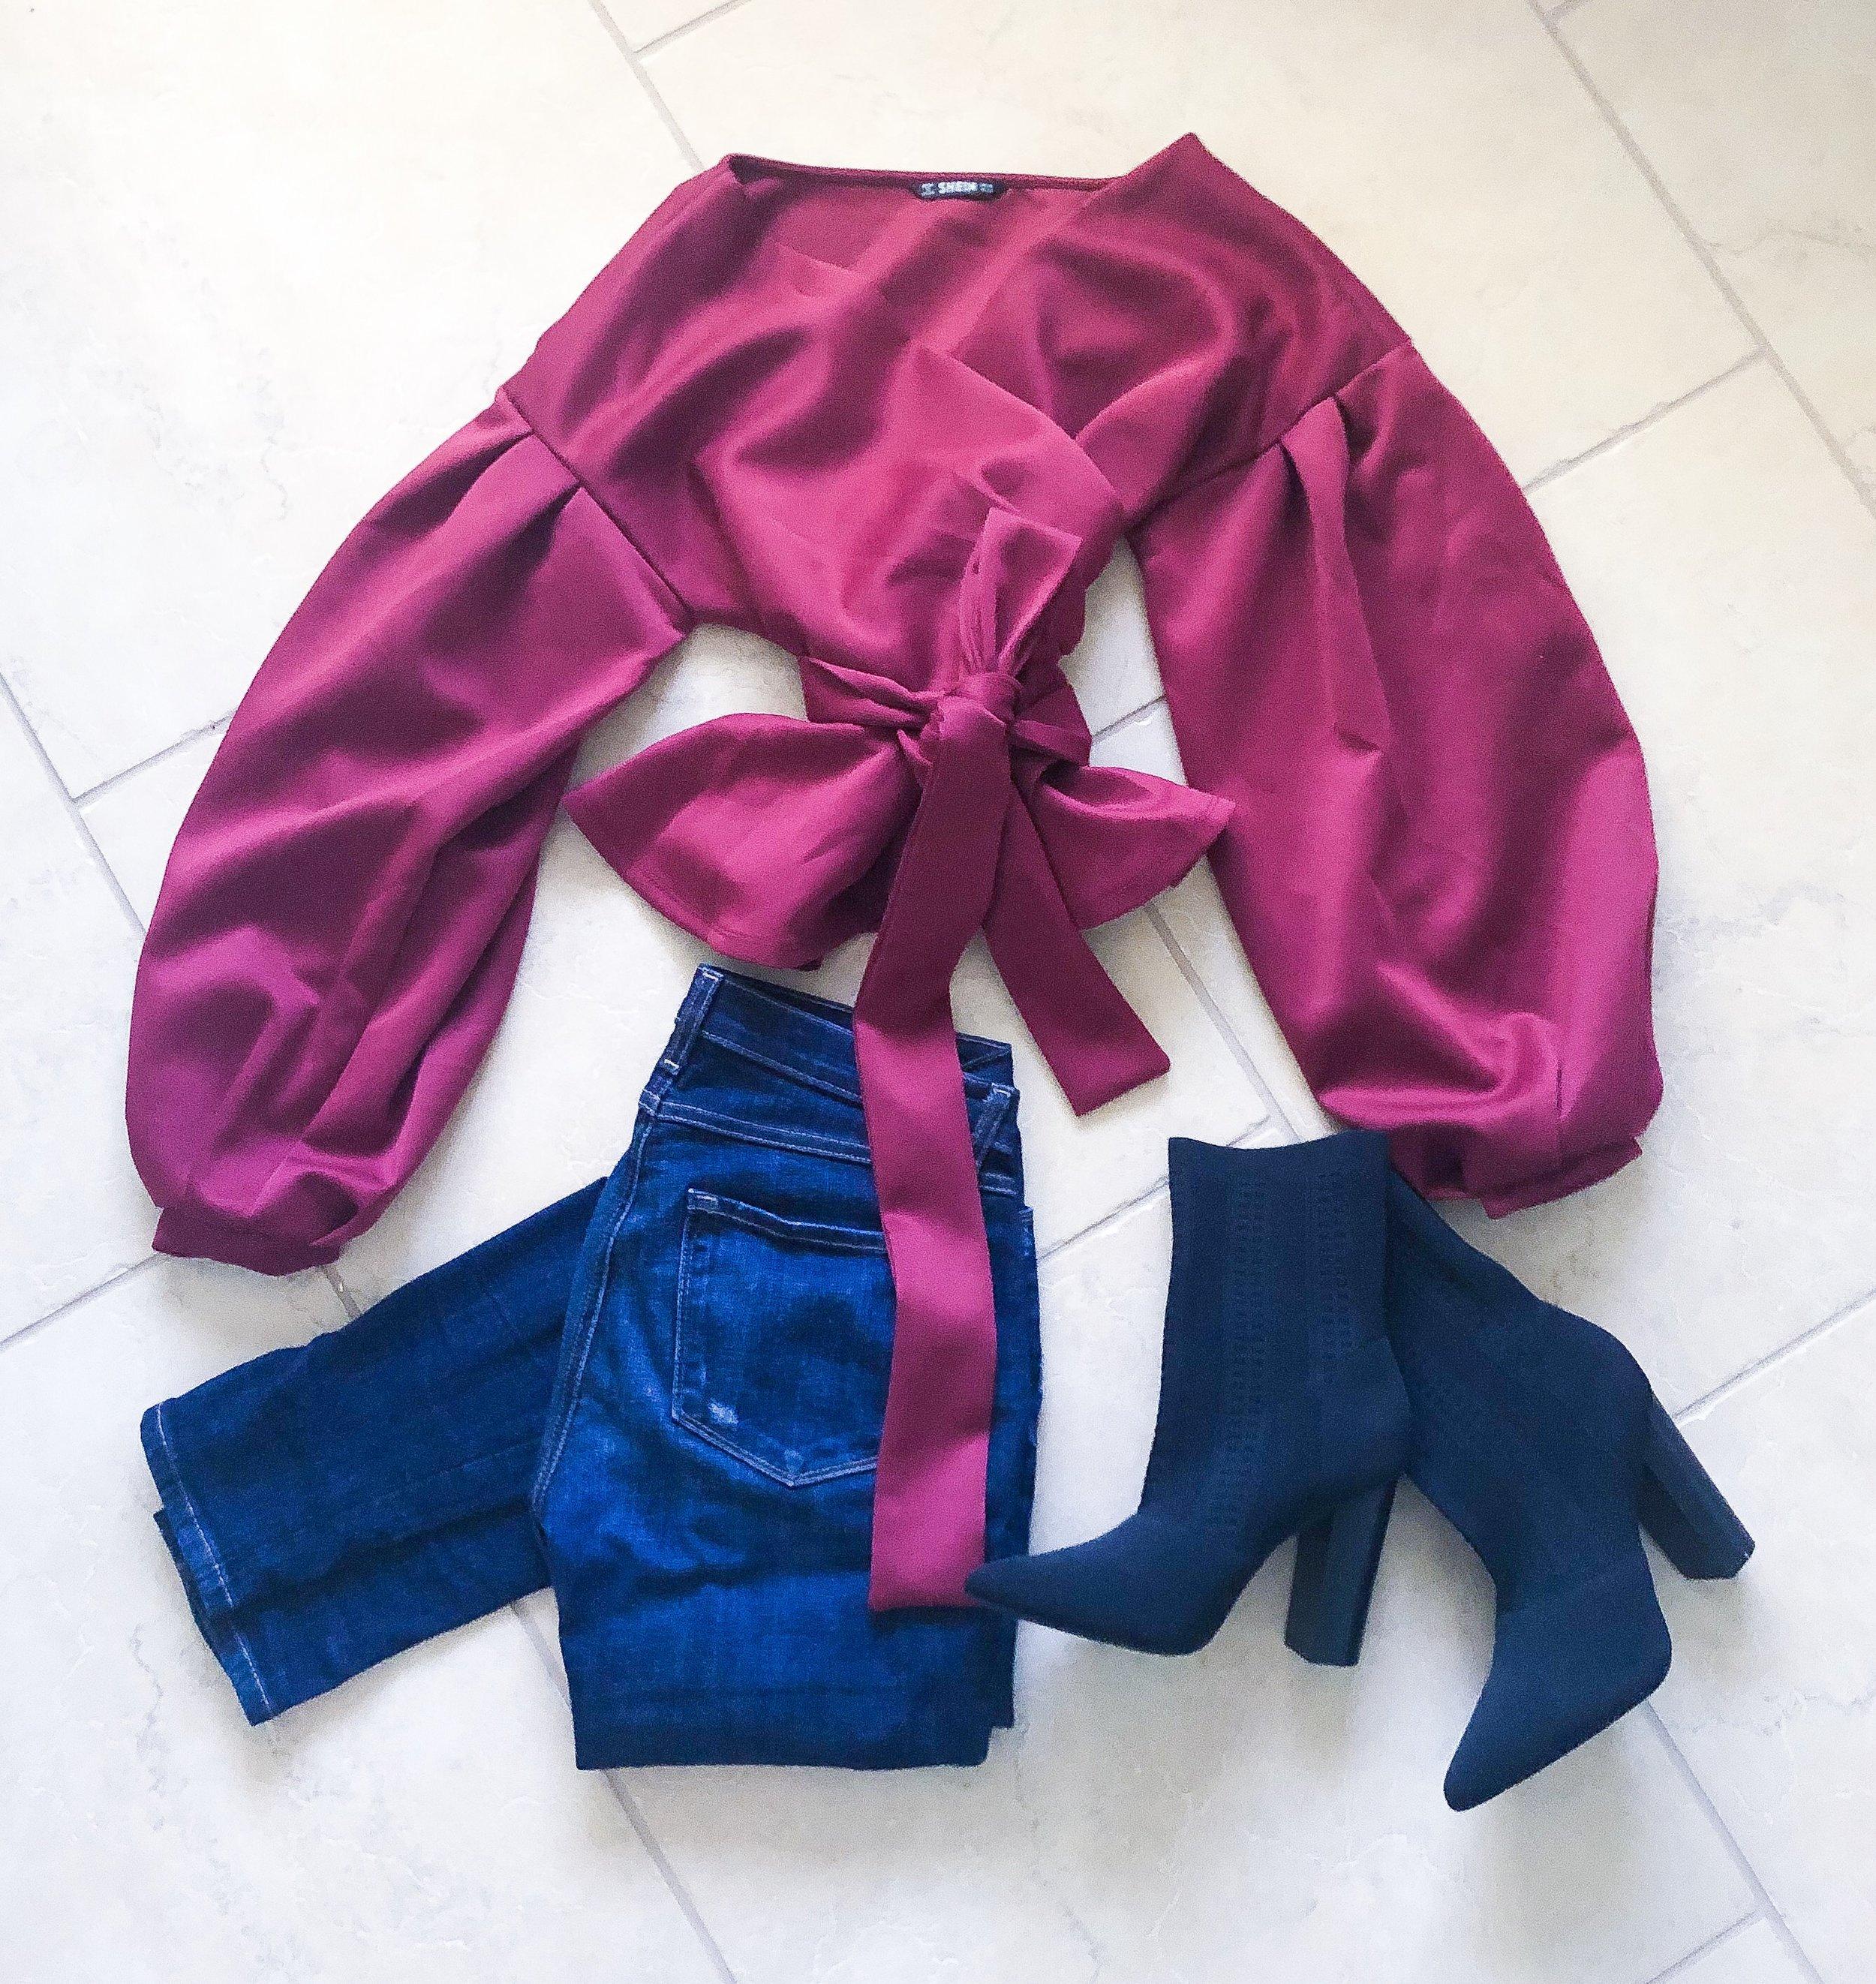 Blouse: SHEIN 595912  http://bit.ly/2E0Xwft , Shoes: ShoeDazzle